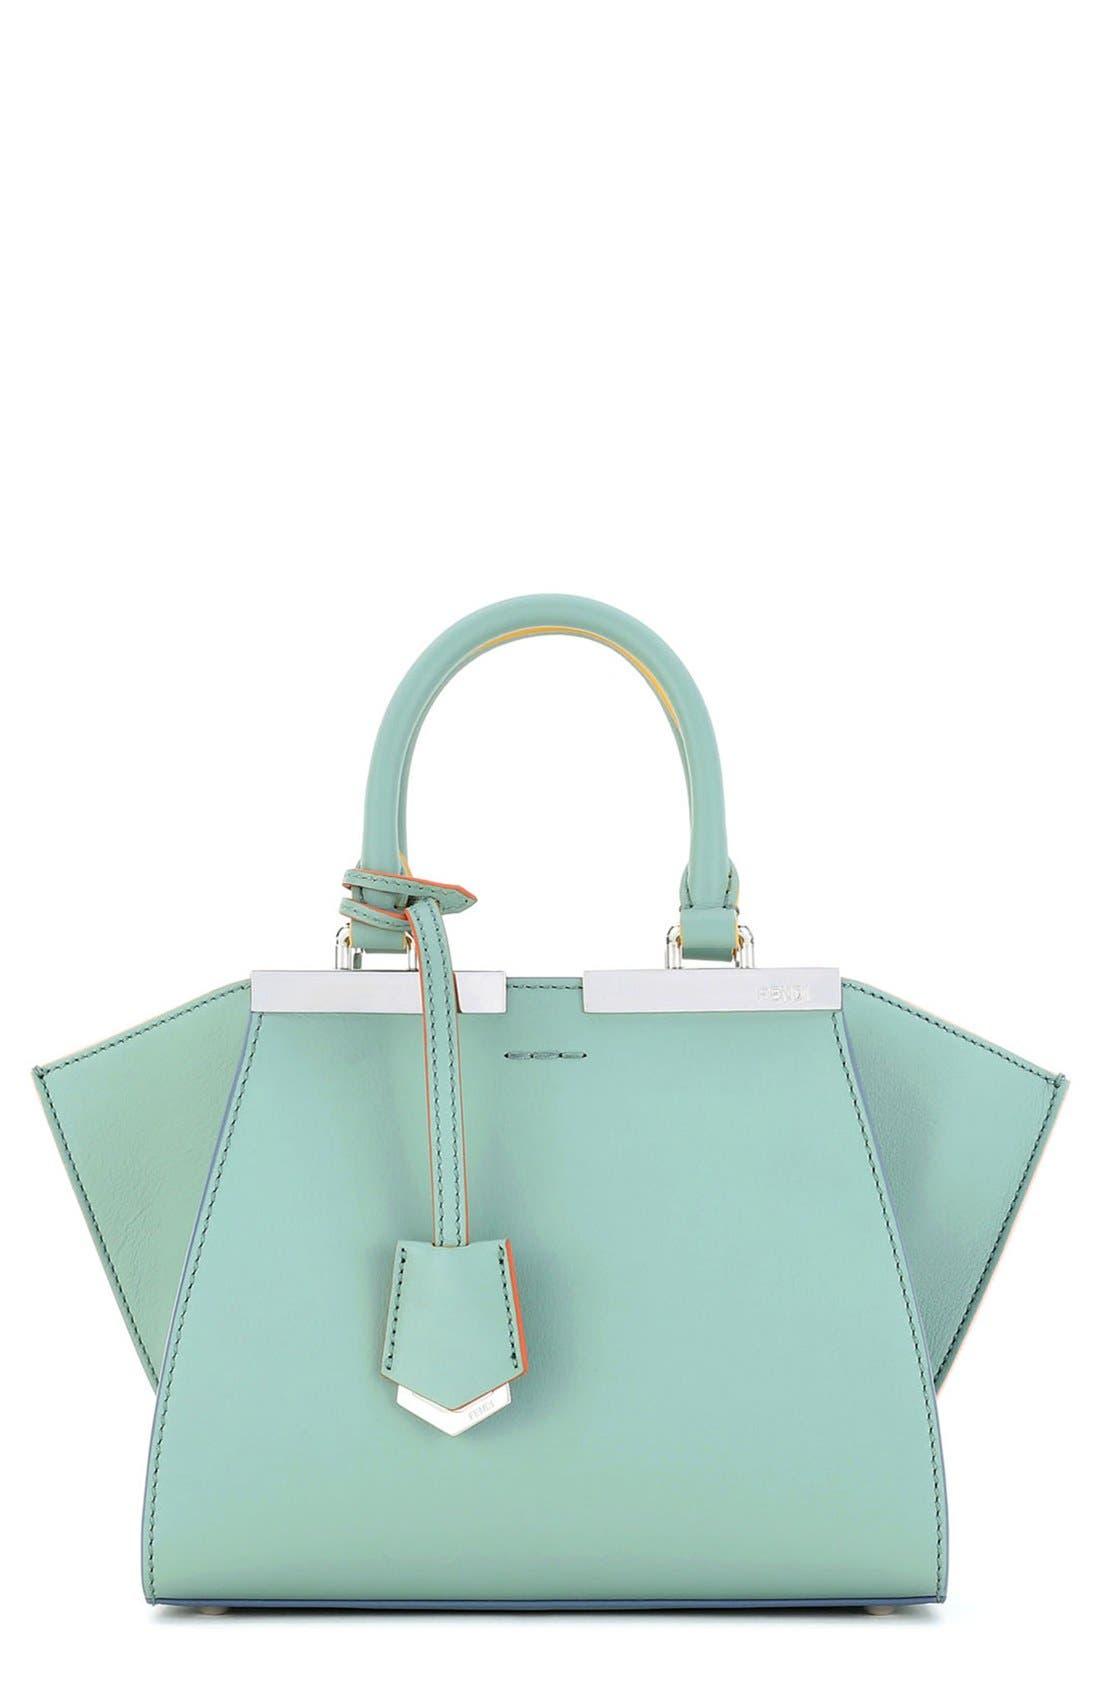 Main Image - Fendi 'Mini 3Jours' Calfskin Leather Shopper